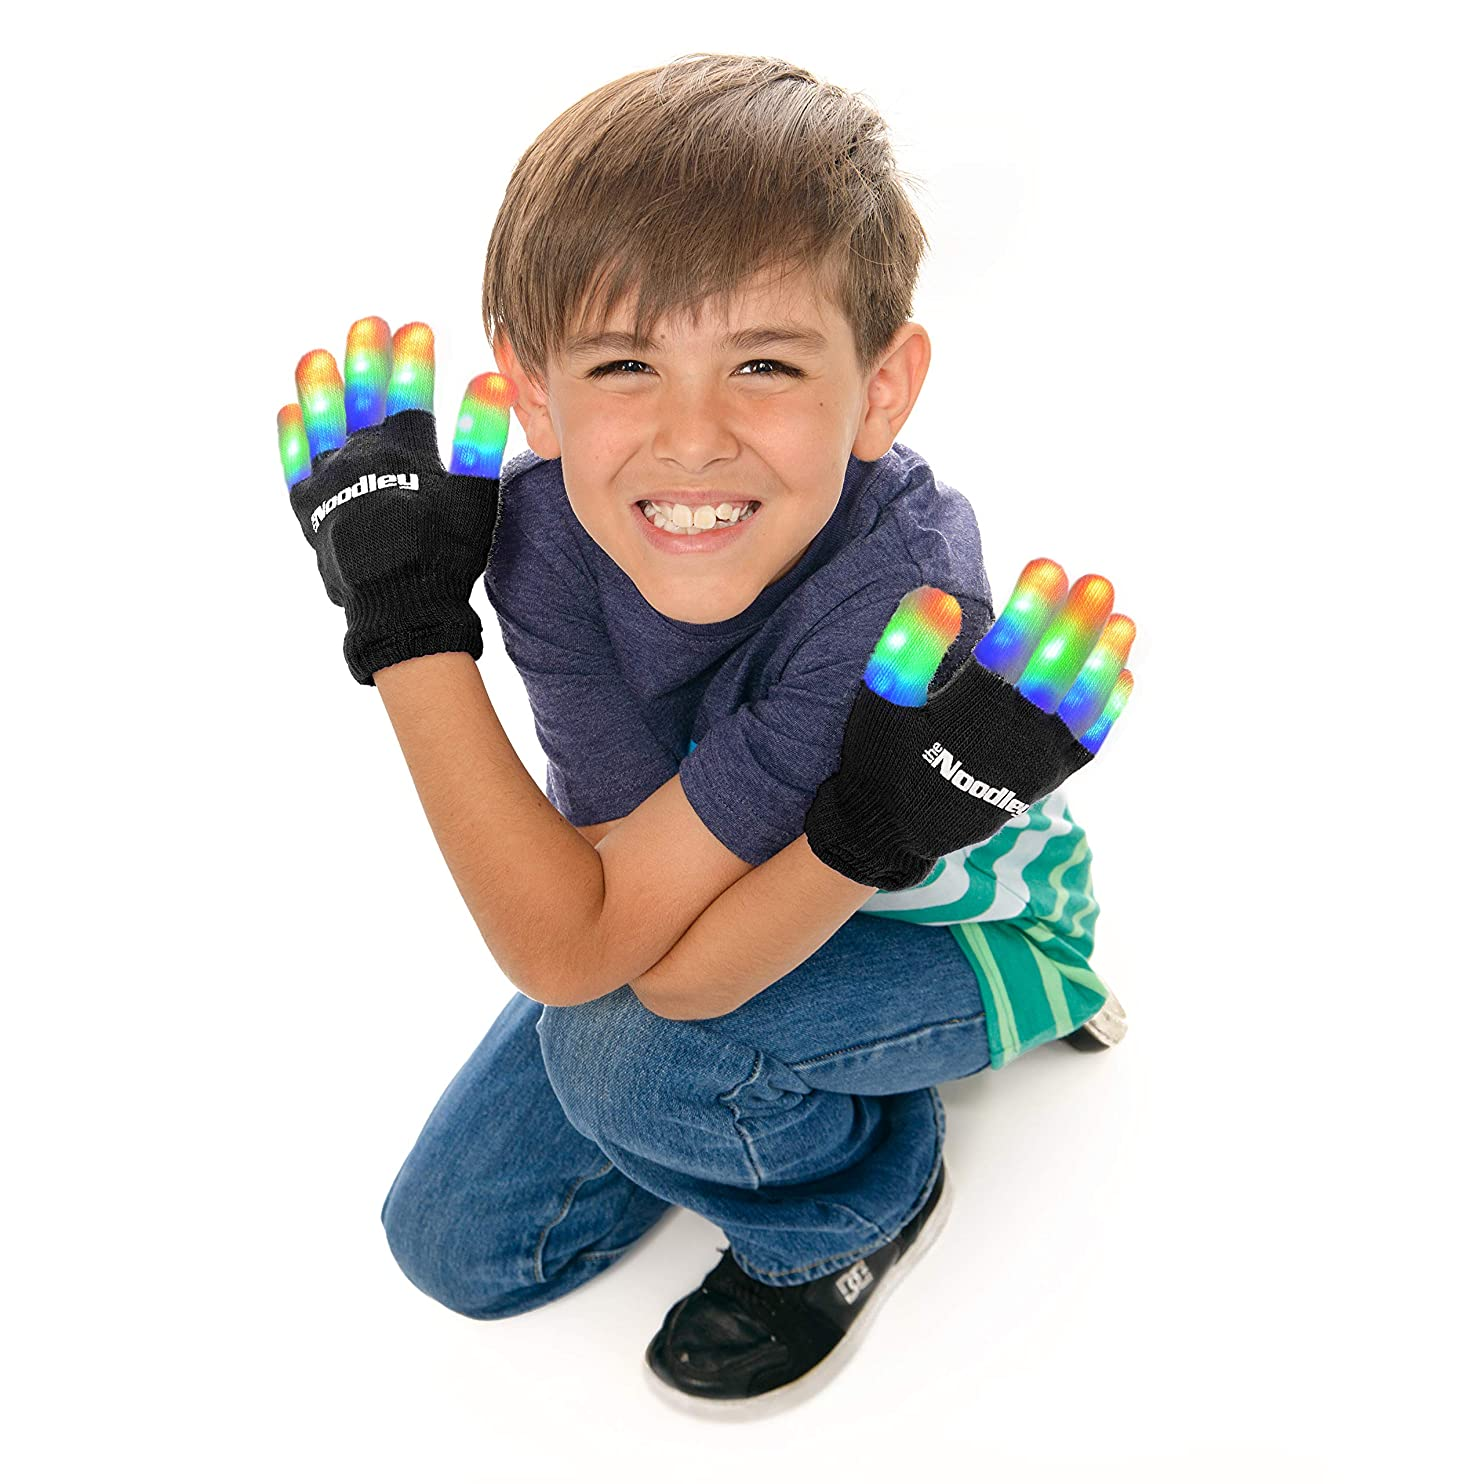 The Noodley Children LED Finger Light Gloves - Boys Toys & Kids Gifts Games (Small, Black) xhcbqzmcvhs82